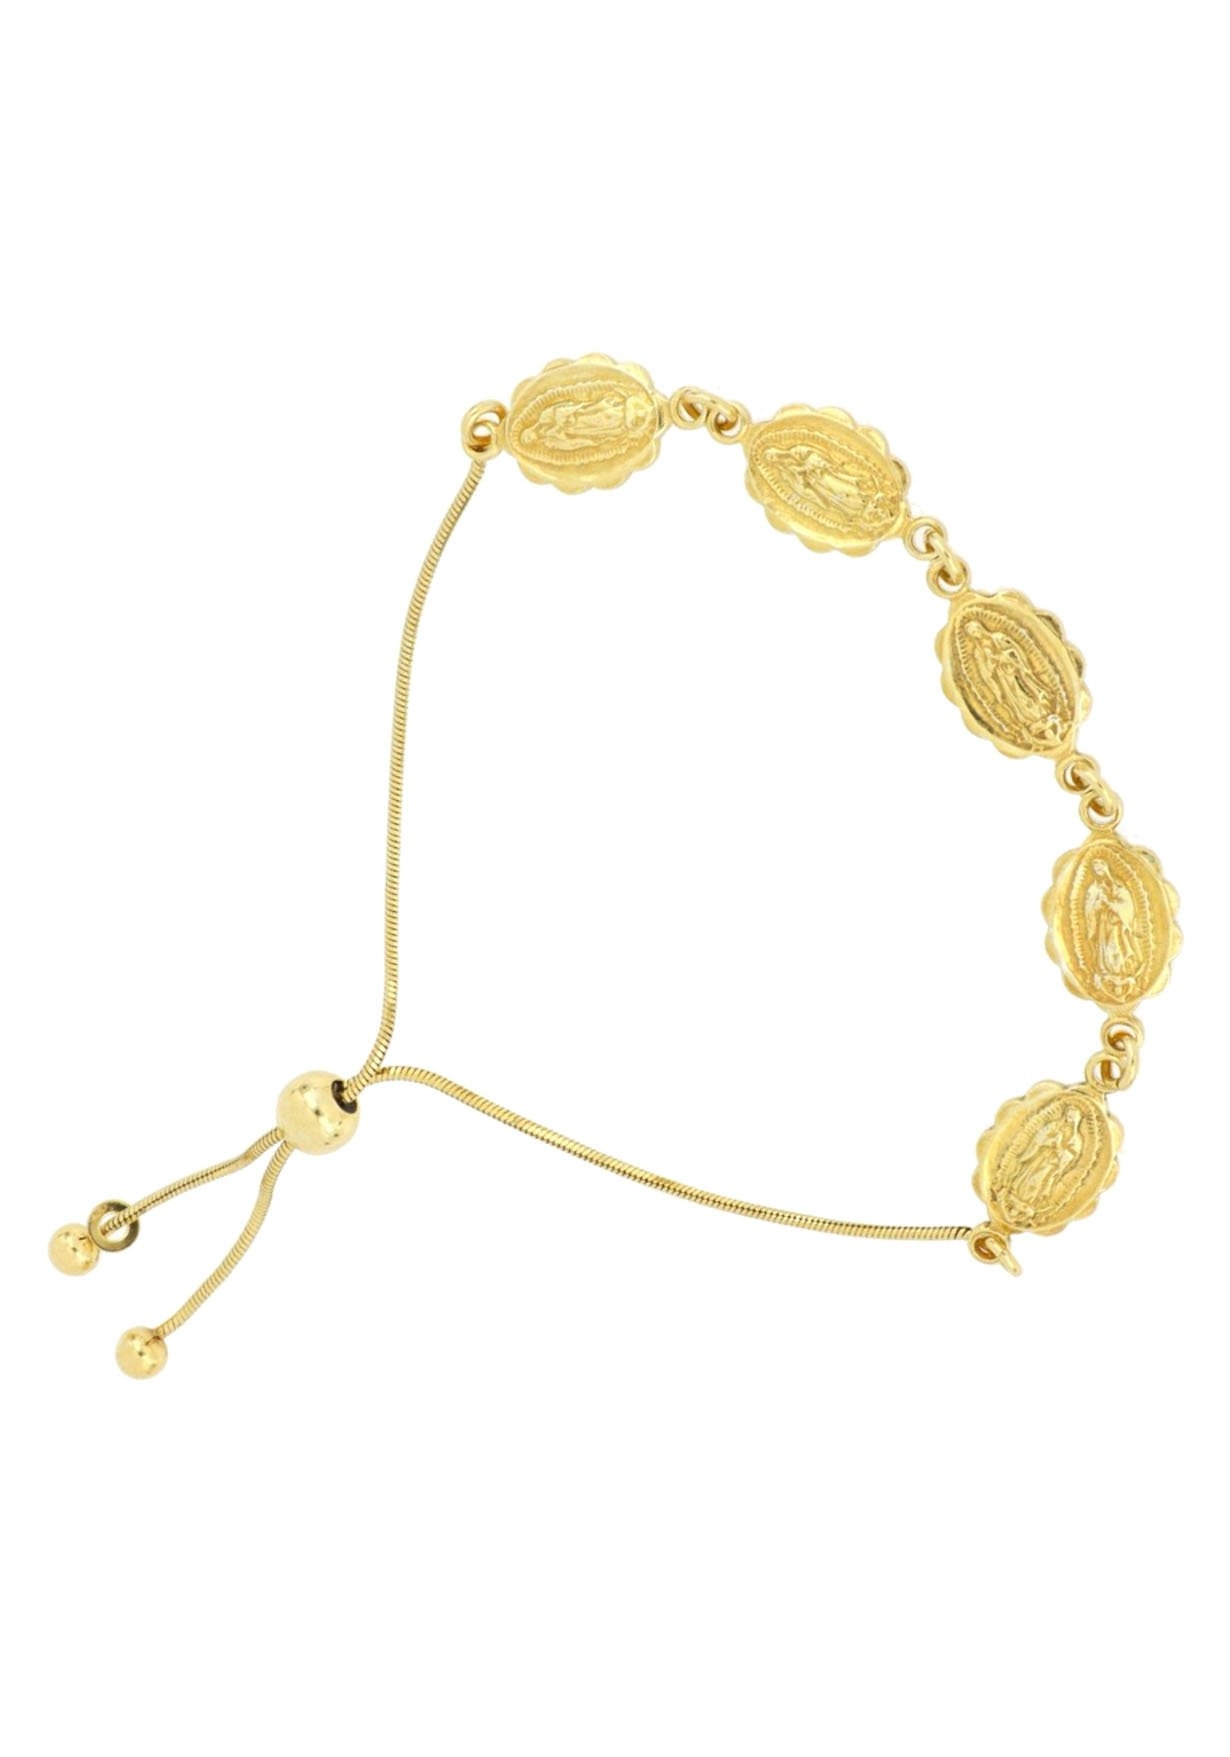 Firetti Armband Maritieme afbeelding, platte ovale schakels, glans, verguld nu online kopen bij OTTO